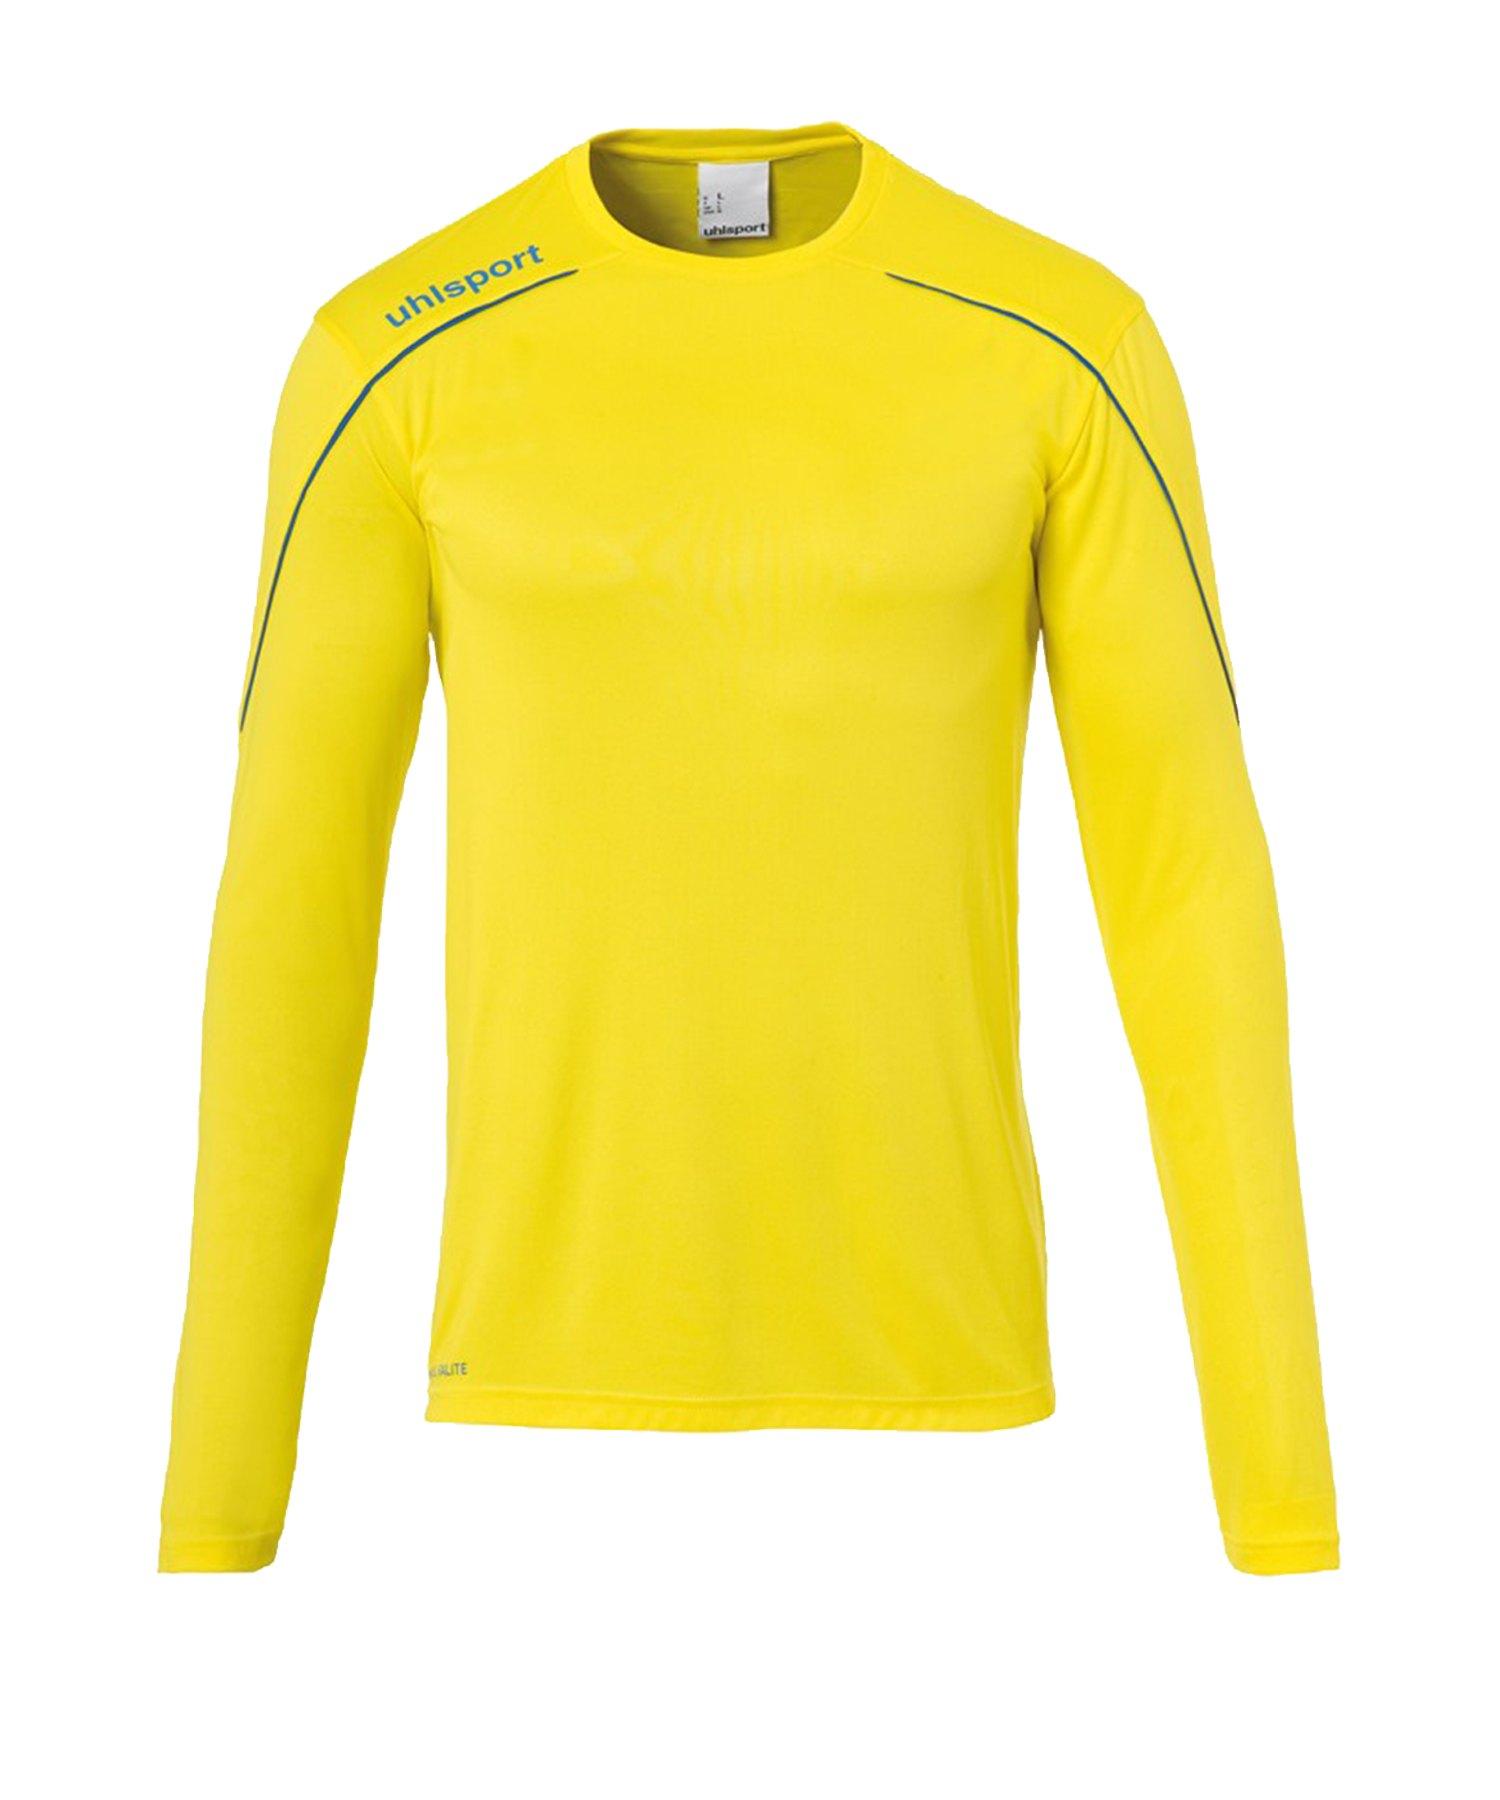 Uhlsport Stream 22 Trikot langarm Gelb Blau F11 - Gelb